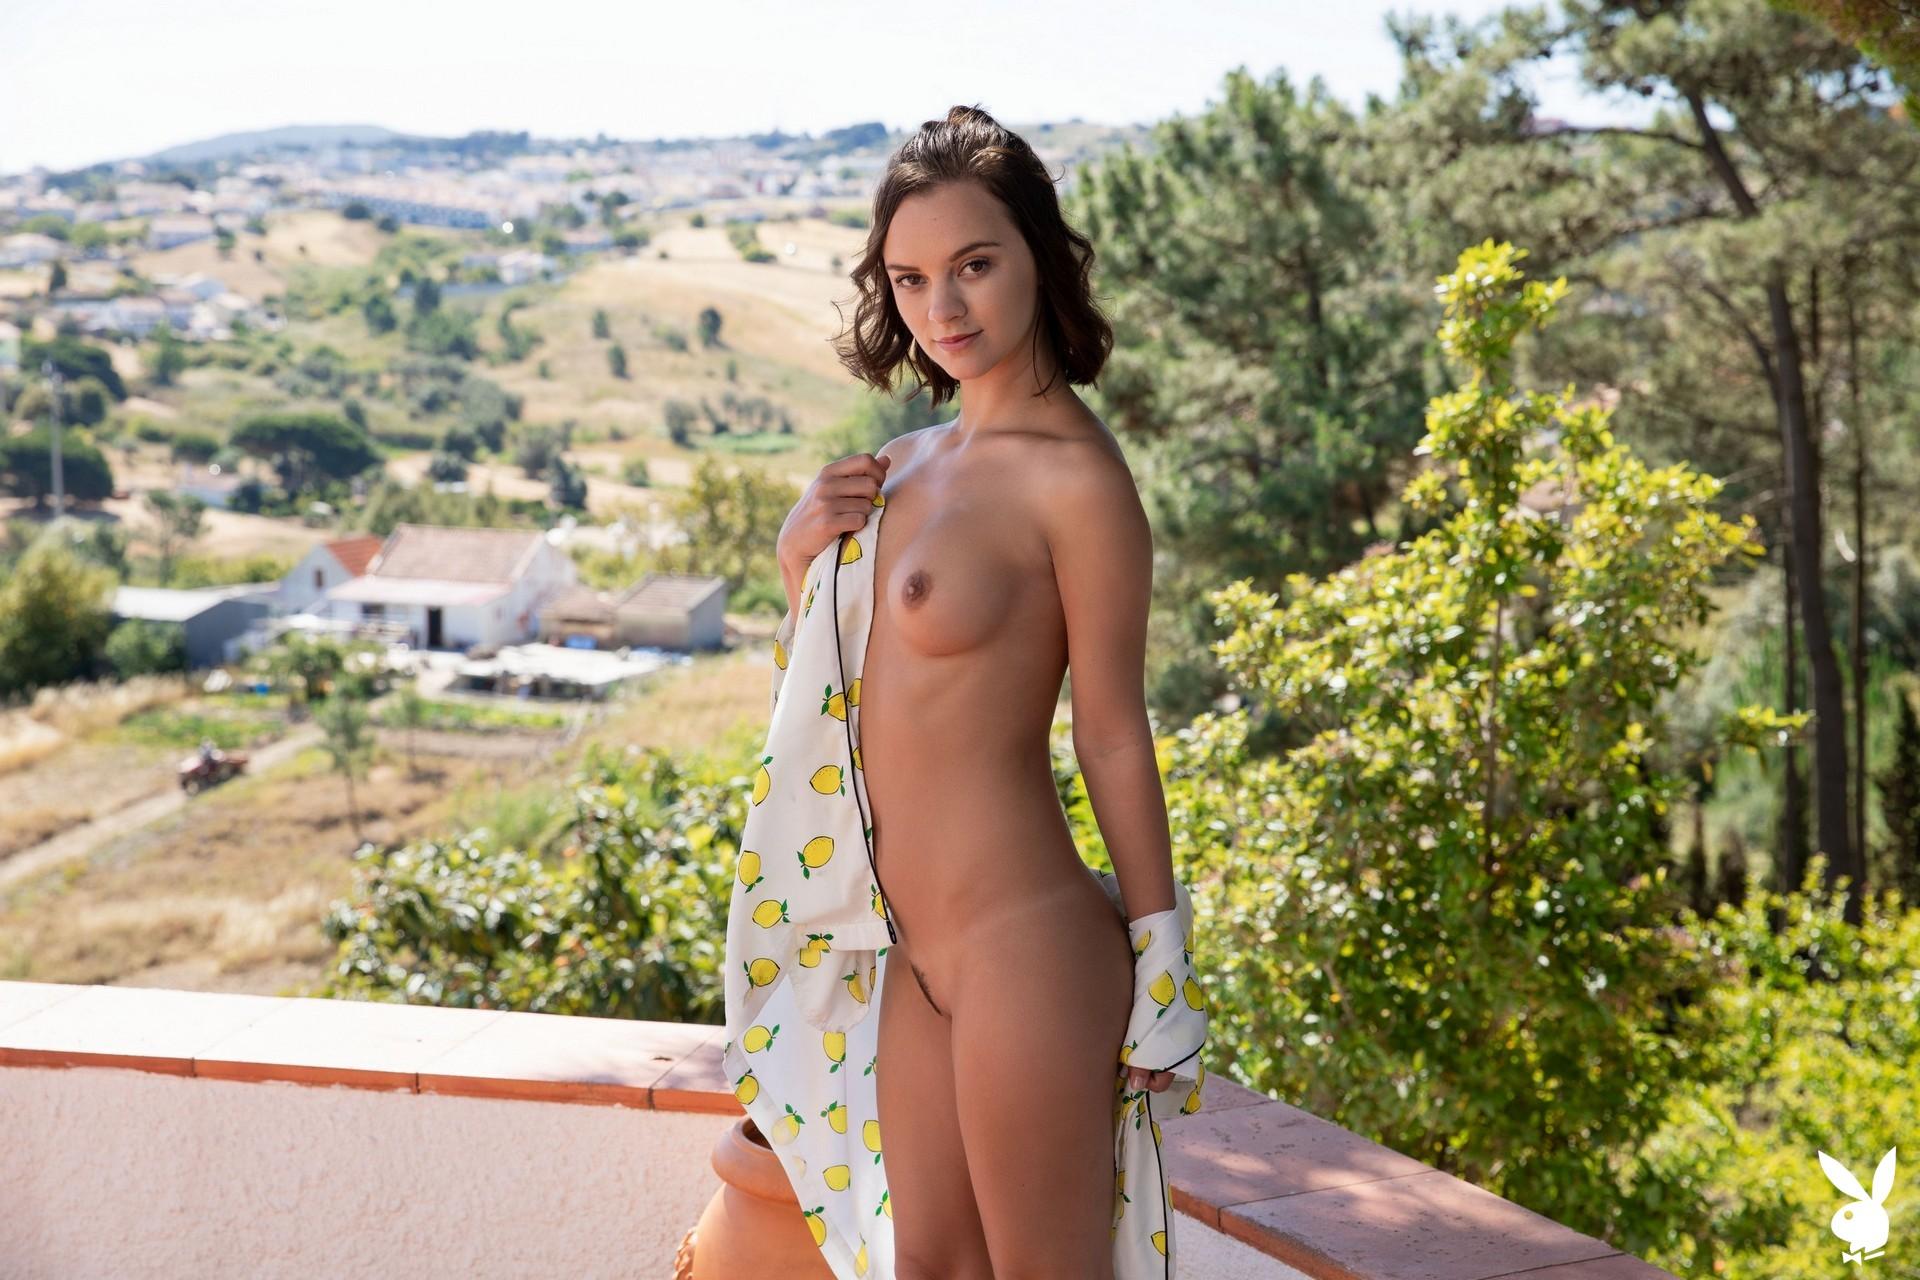 Marine Lecourt In Country Summit Playboy Plus (23)